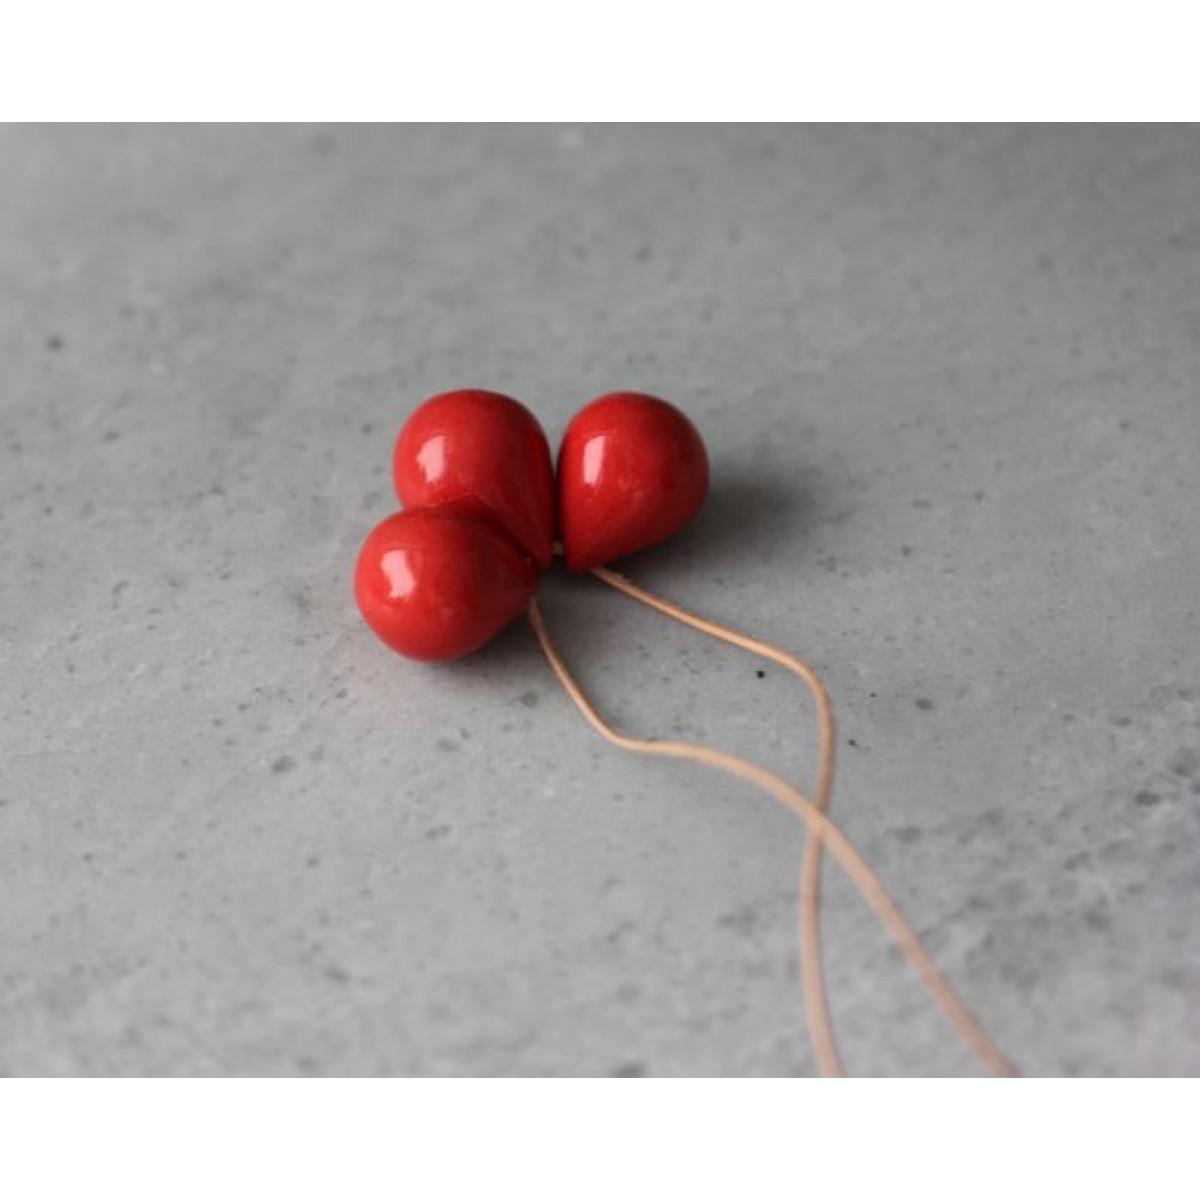 "Skelini - Porzellantropfenkette, ""drei Tropfen"", Rot"